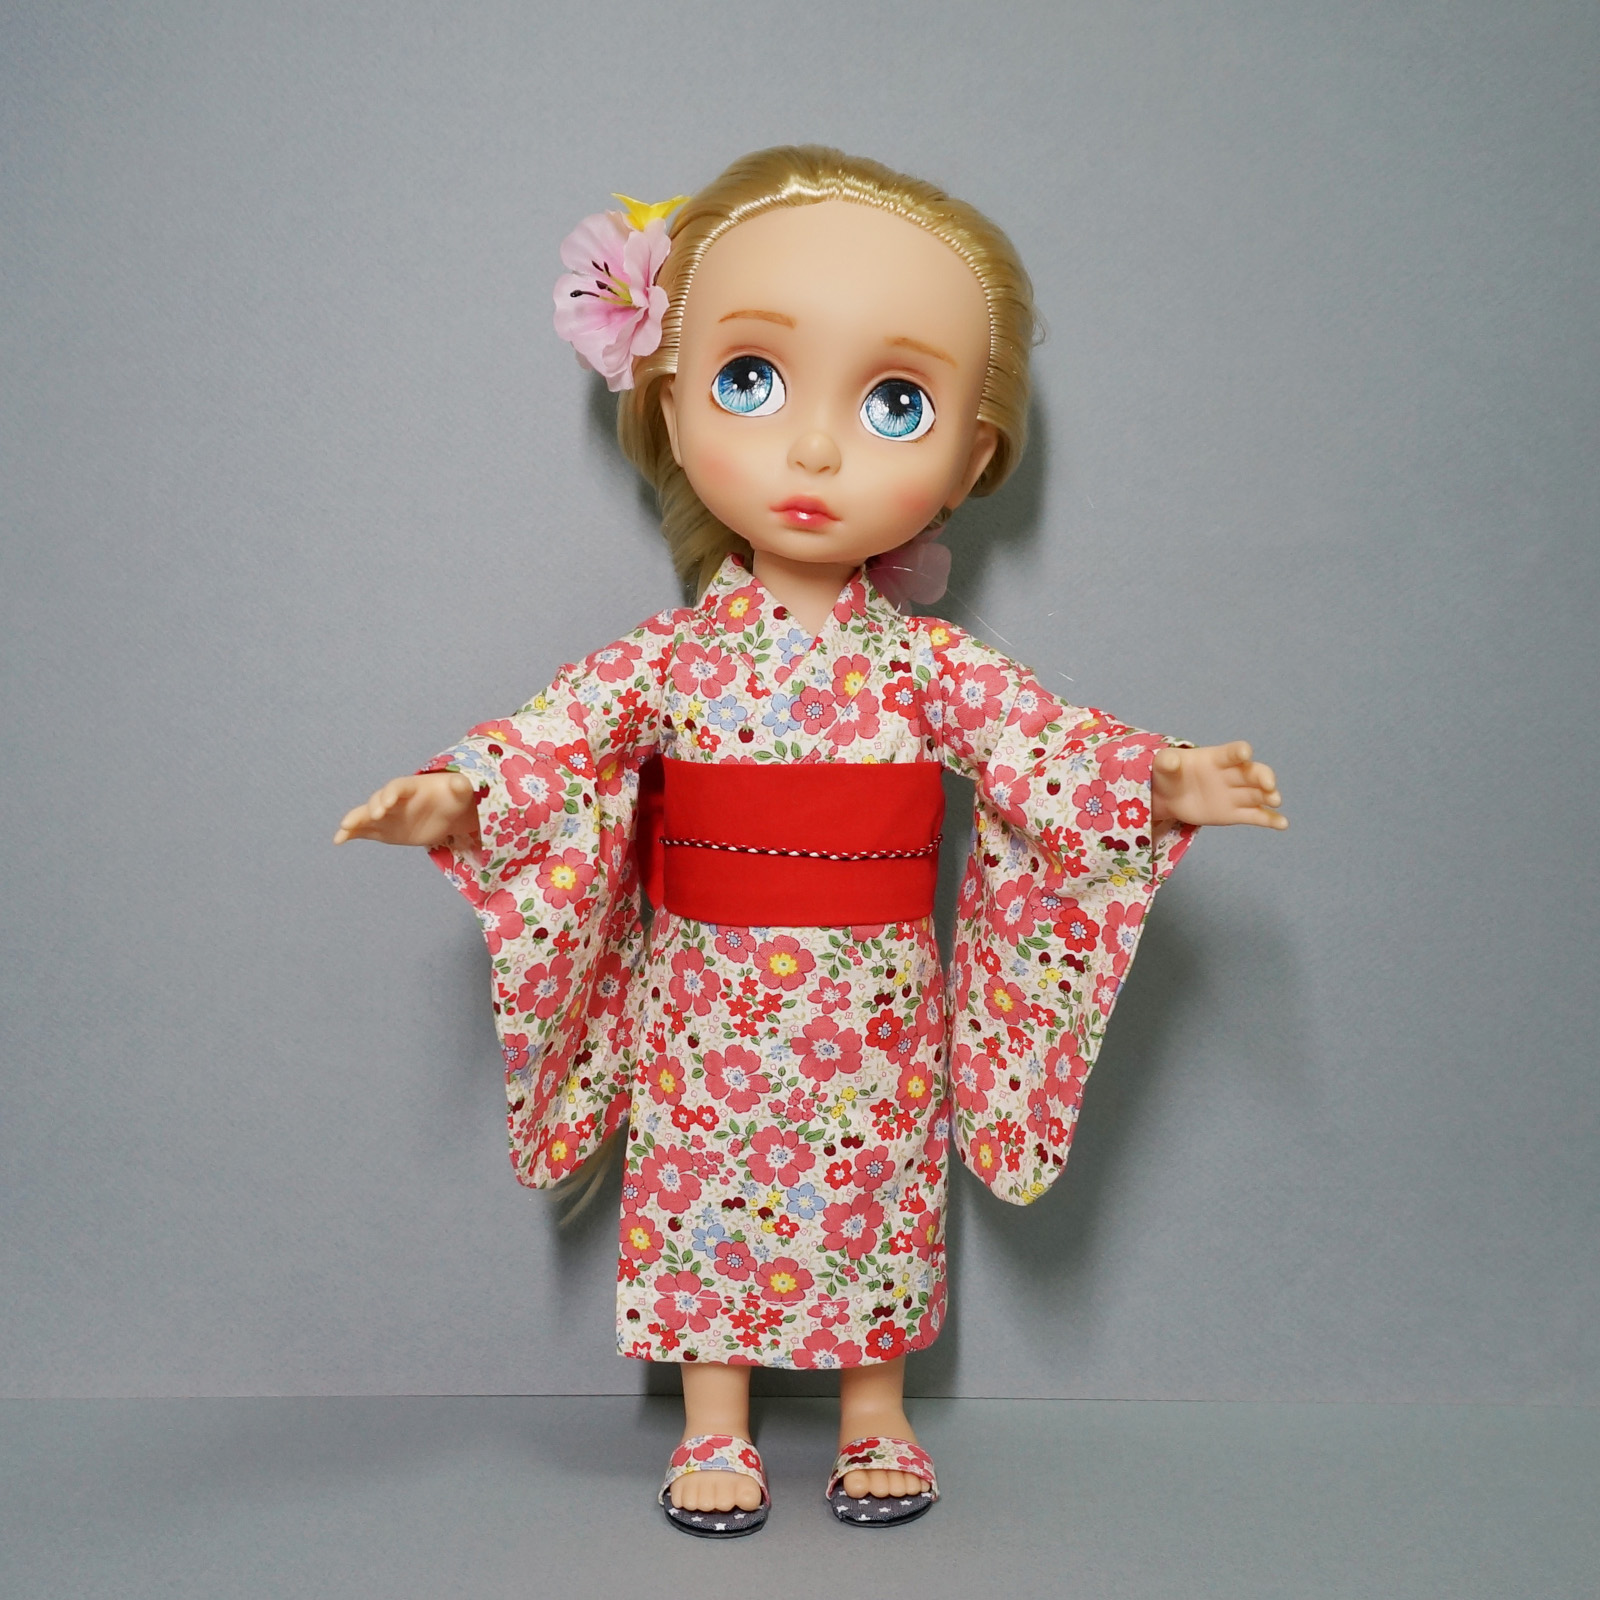 Disney Princess Doll Clothes: Disney Baby Doll Clothes Yukata Flower Dress Clothing